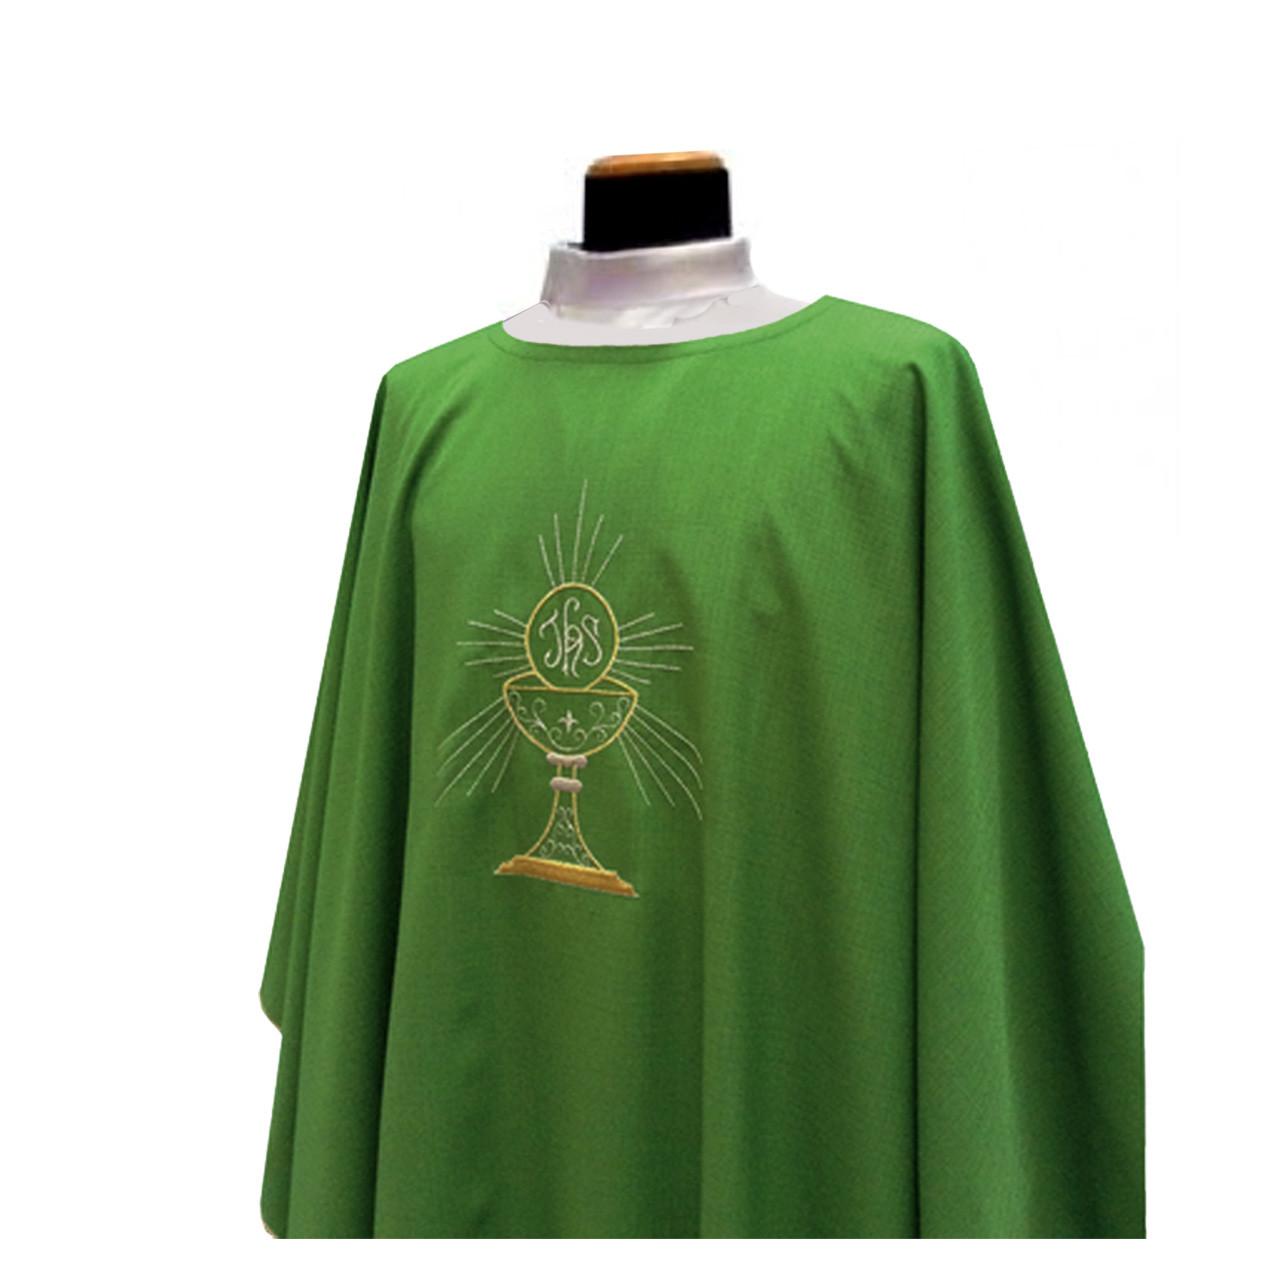 333 Chasuble in Micro Monastico from Solivari